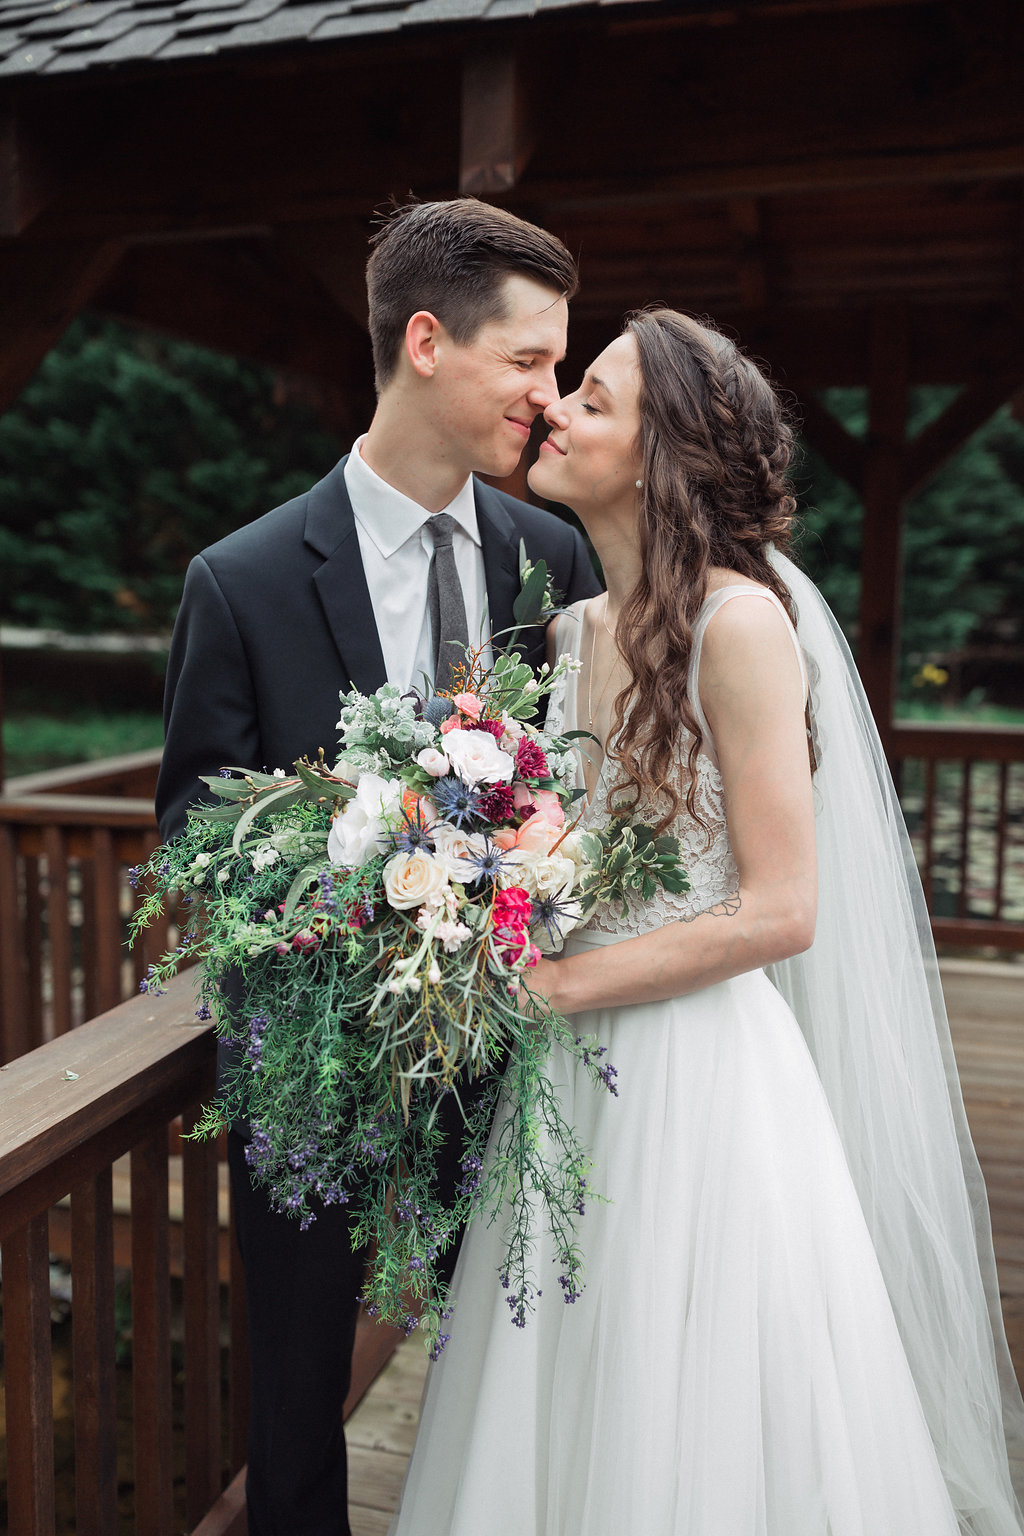 Honeysuckle-Hill-Weddings-Mallory-Patrick-64.jpg